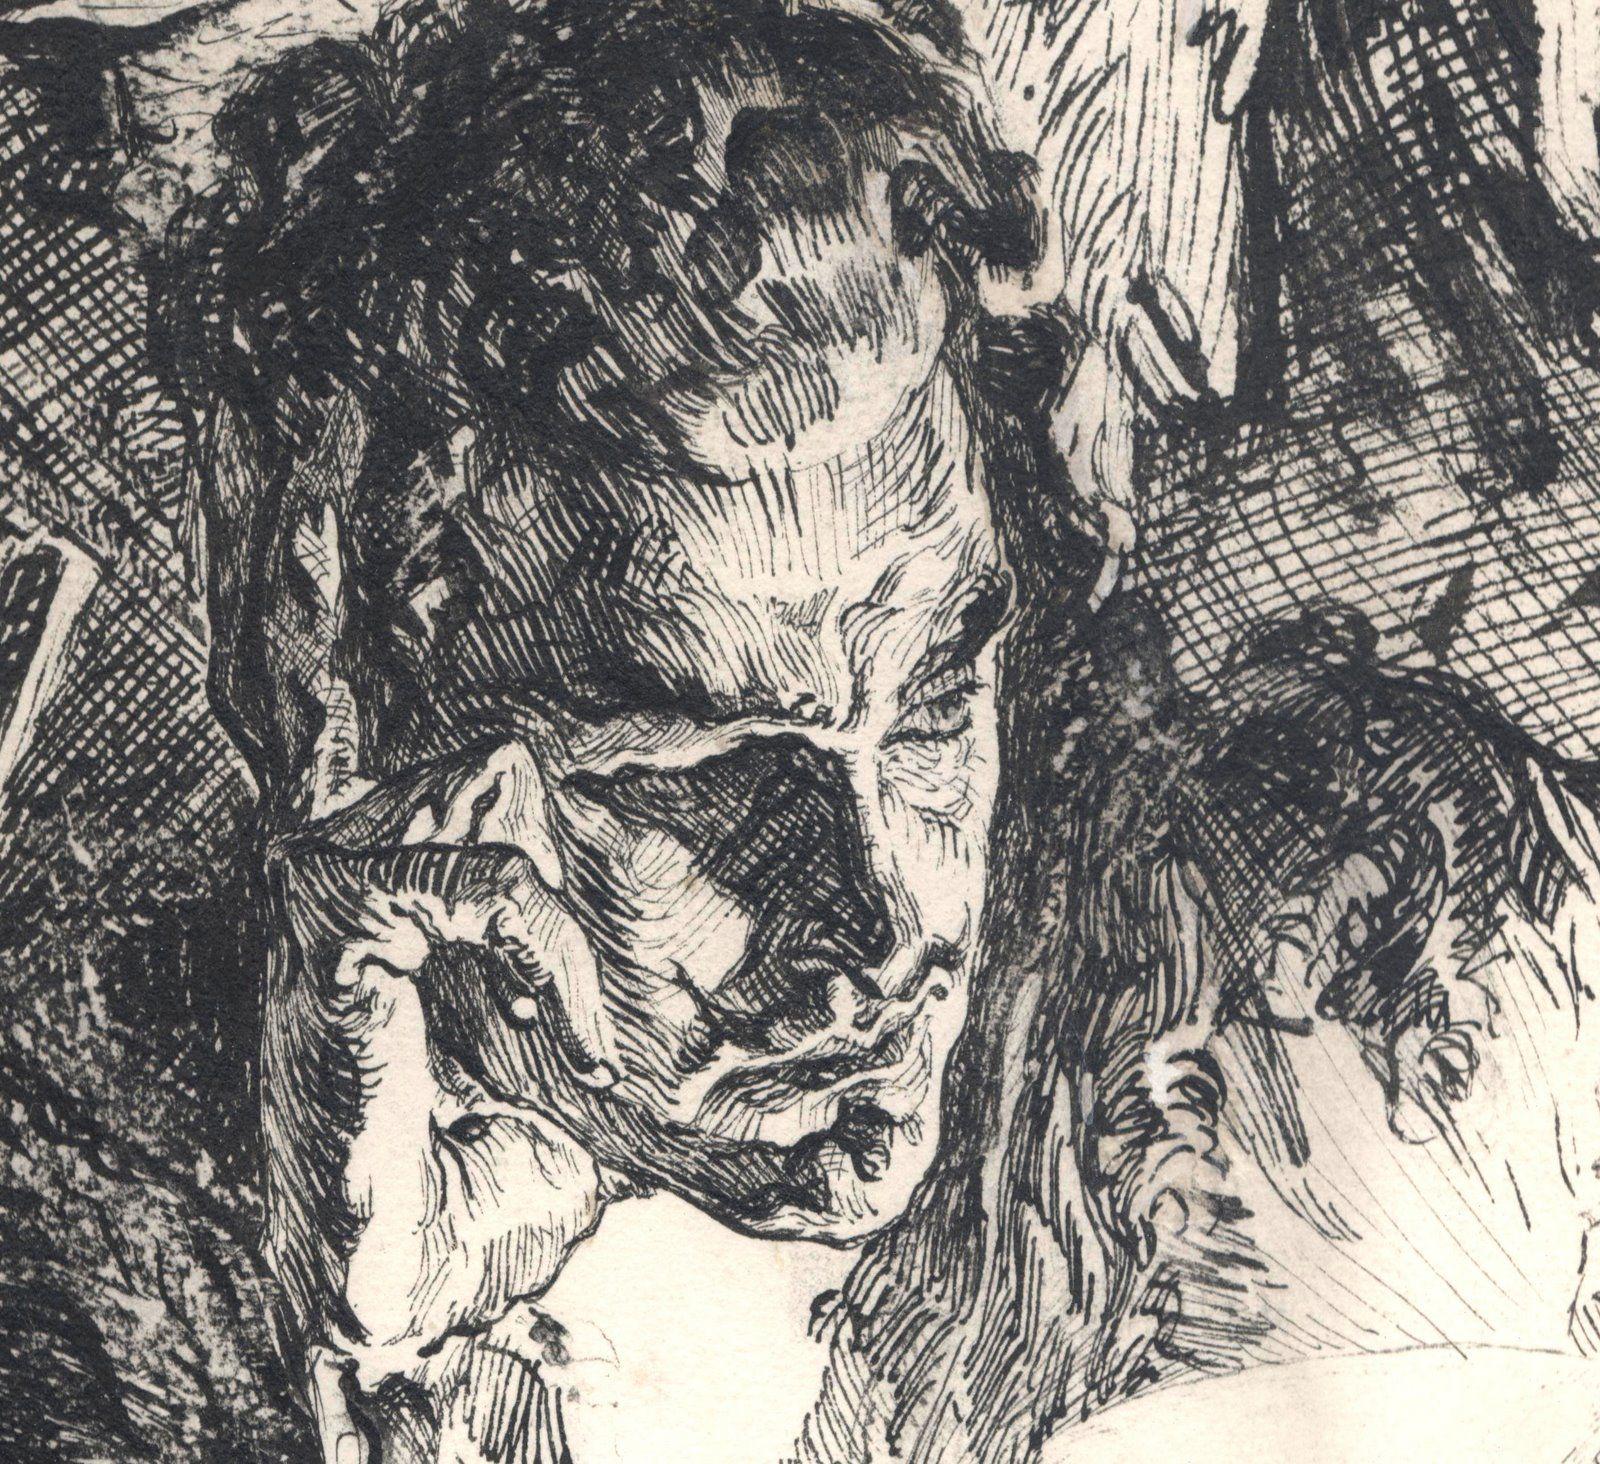 Ink Illustration: Joseph Clement Coll (close-up Of Pen Ink Illustration